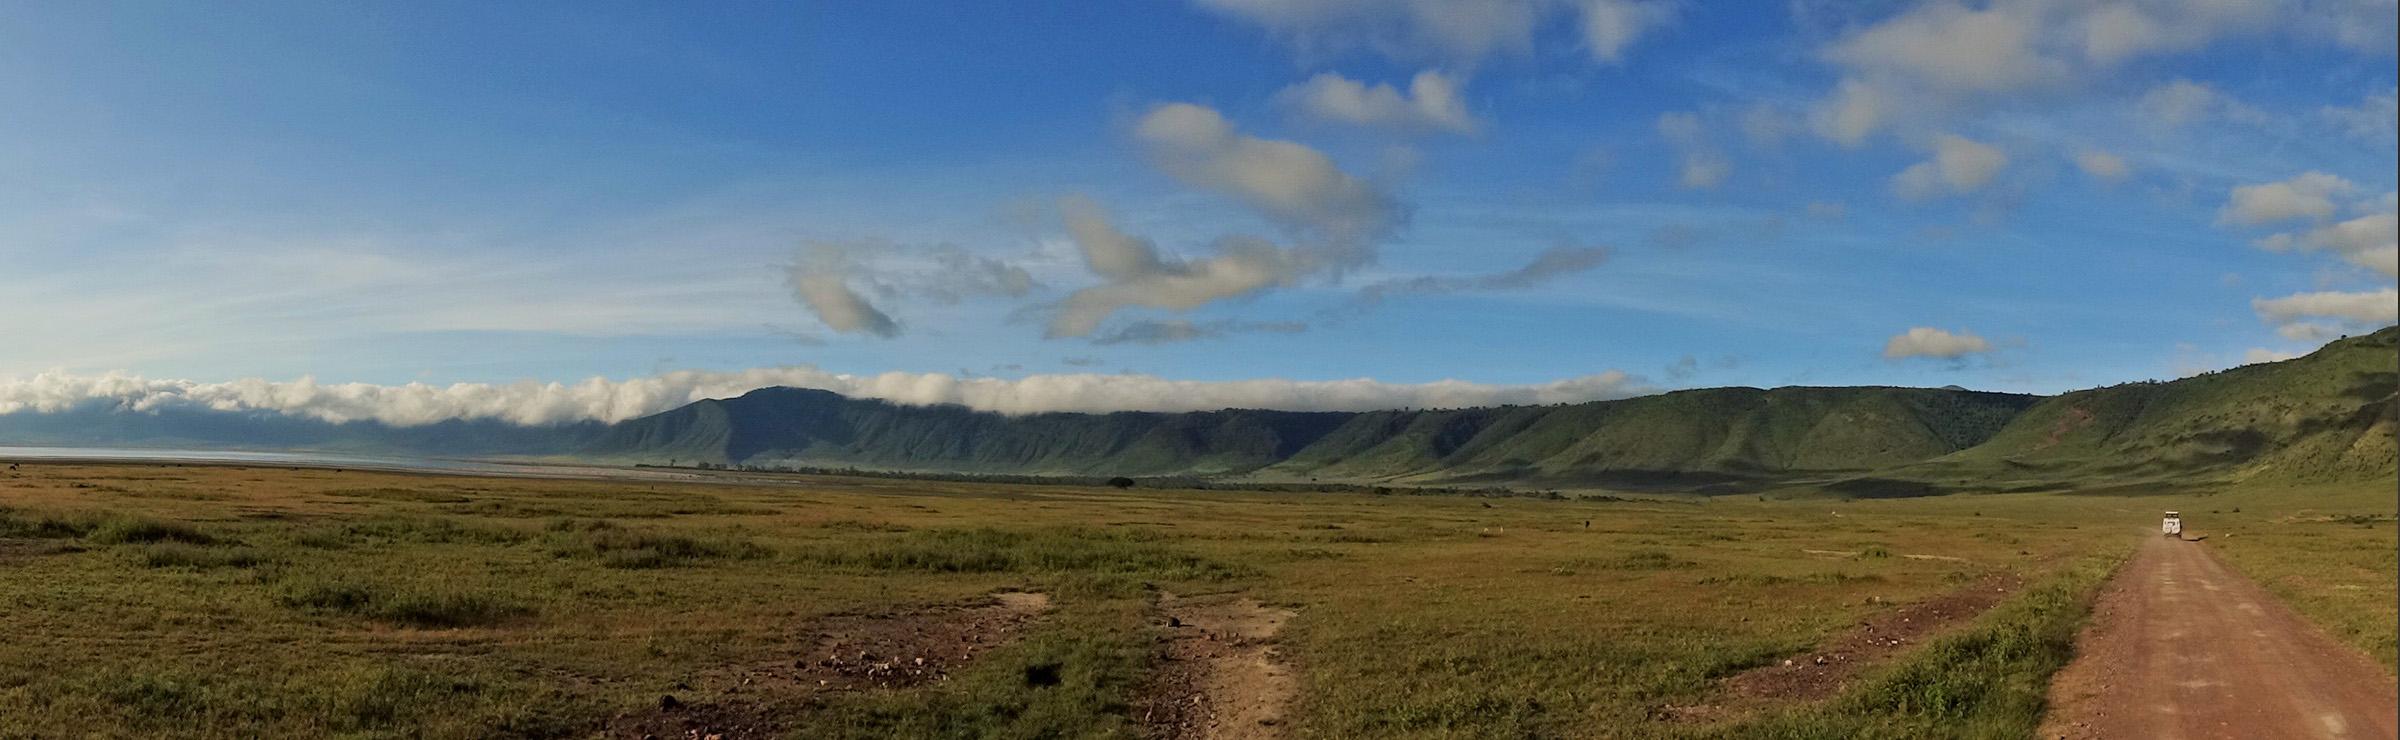 Ngorongoro Crater, Tanzania - by Cuzco84